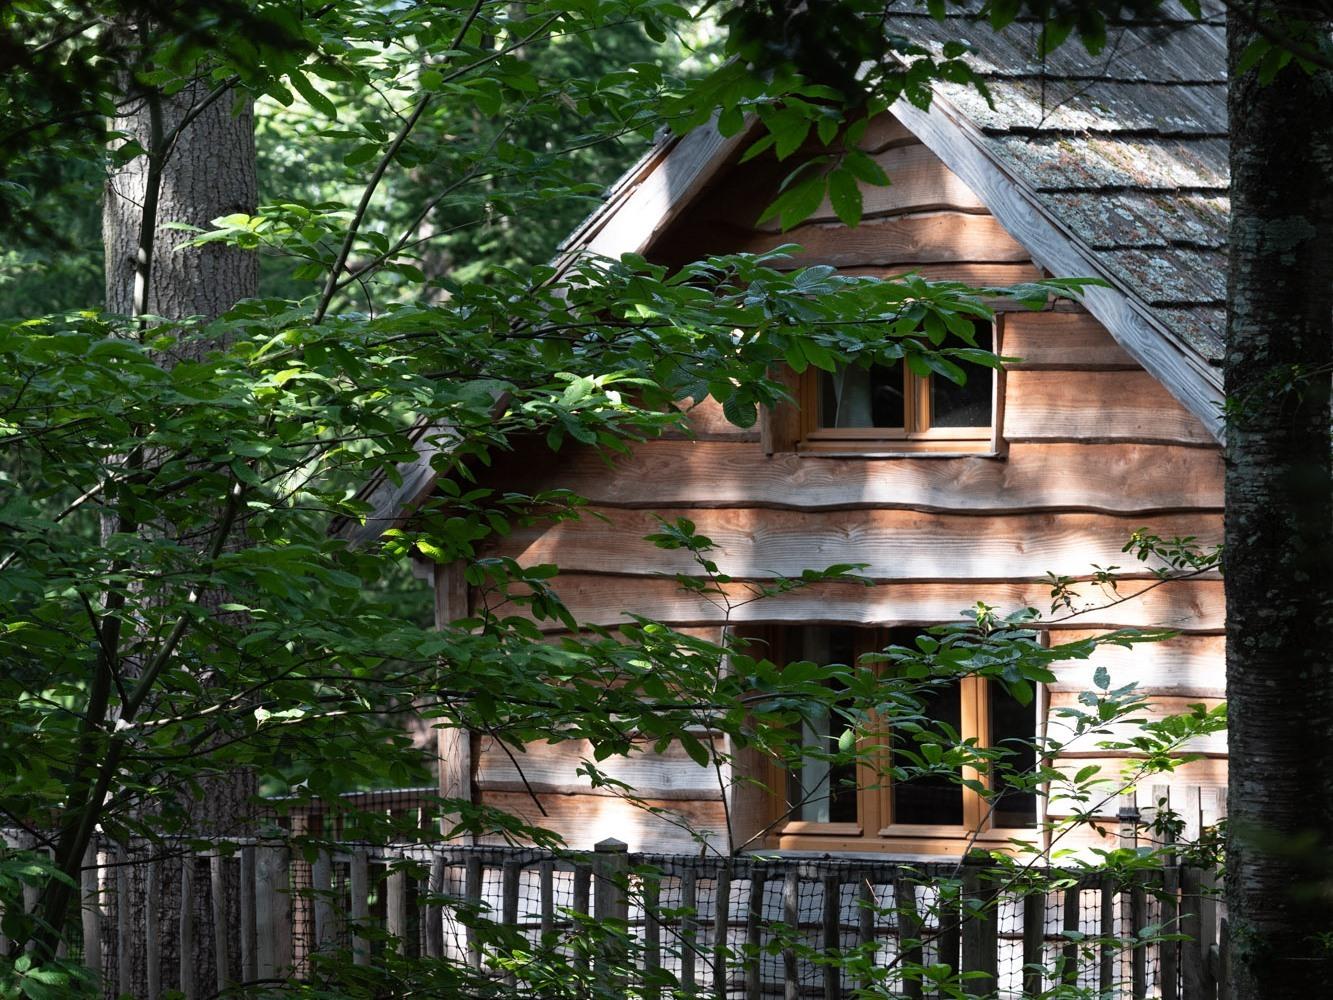 Cabine-de Luxe-Salle de bain Commune-Terrasse-Cabane PANDA Insolite